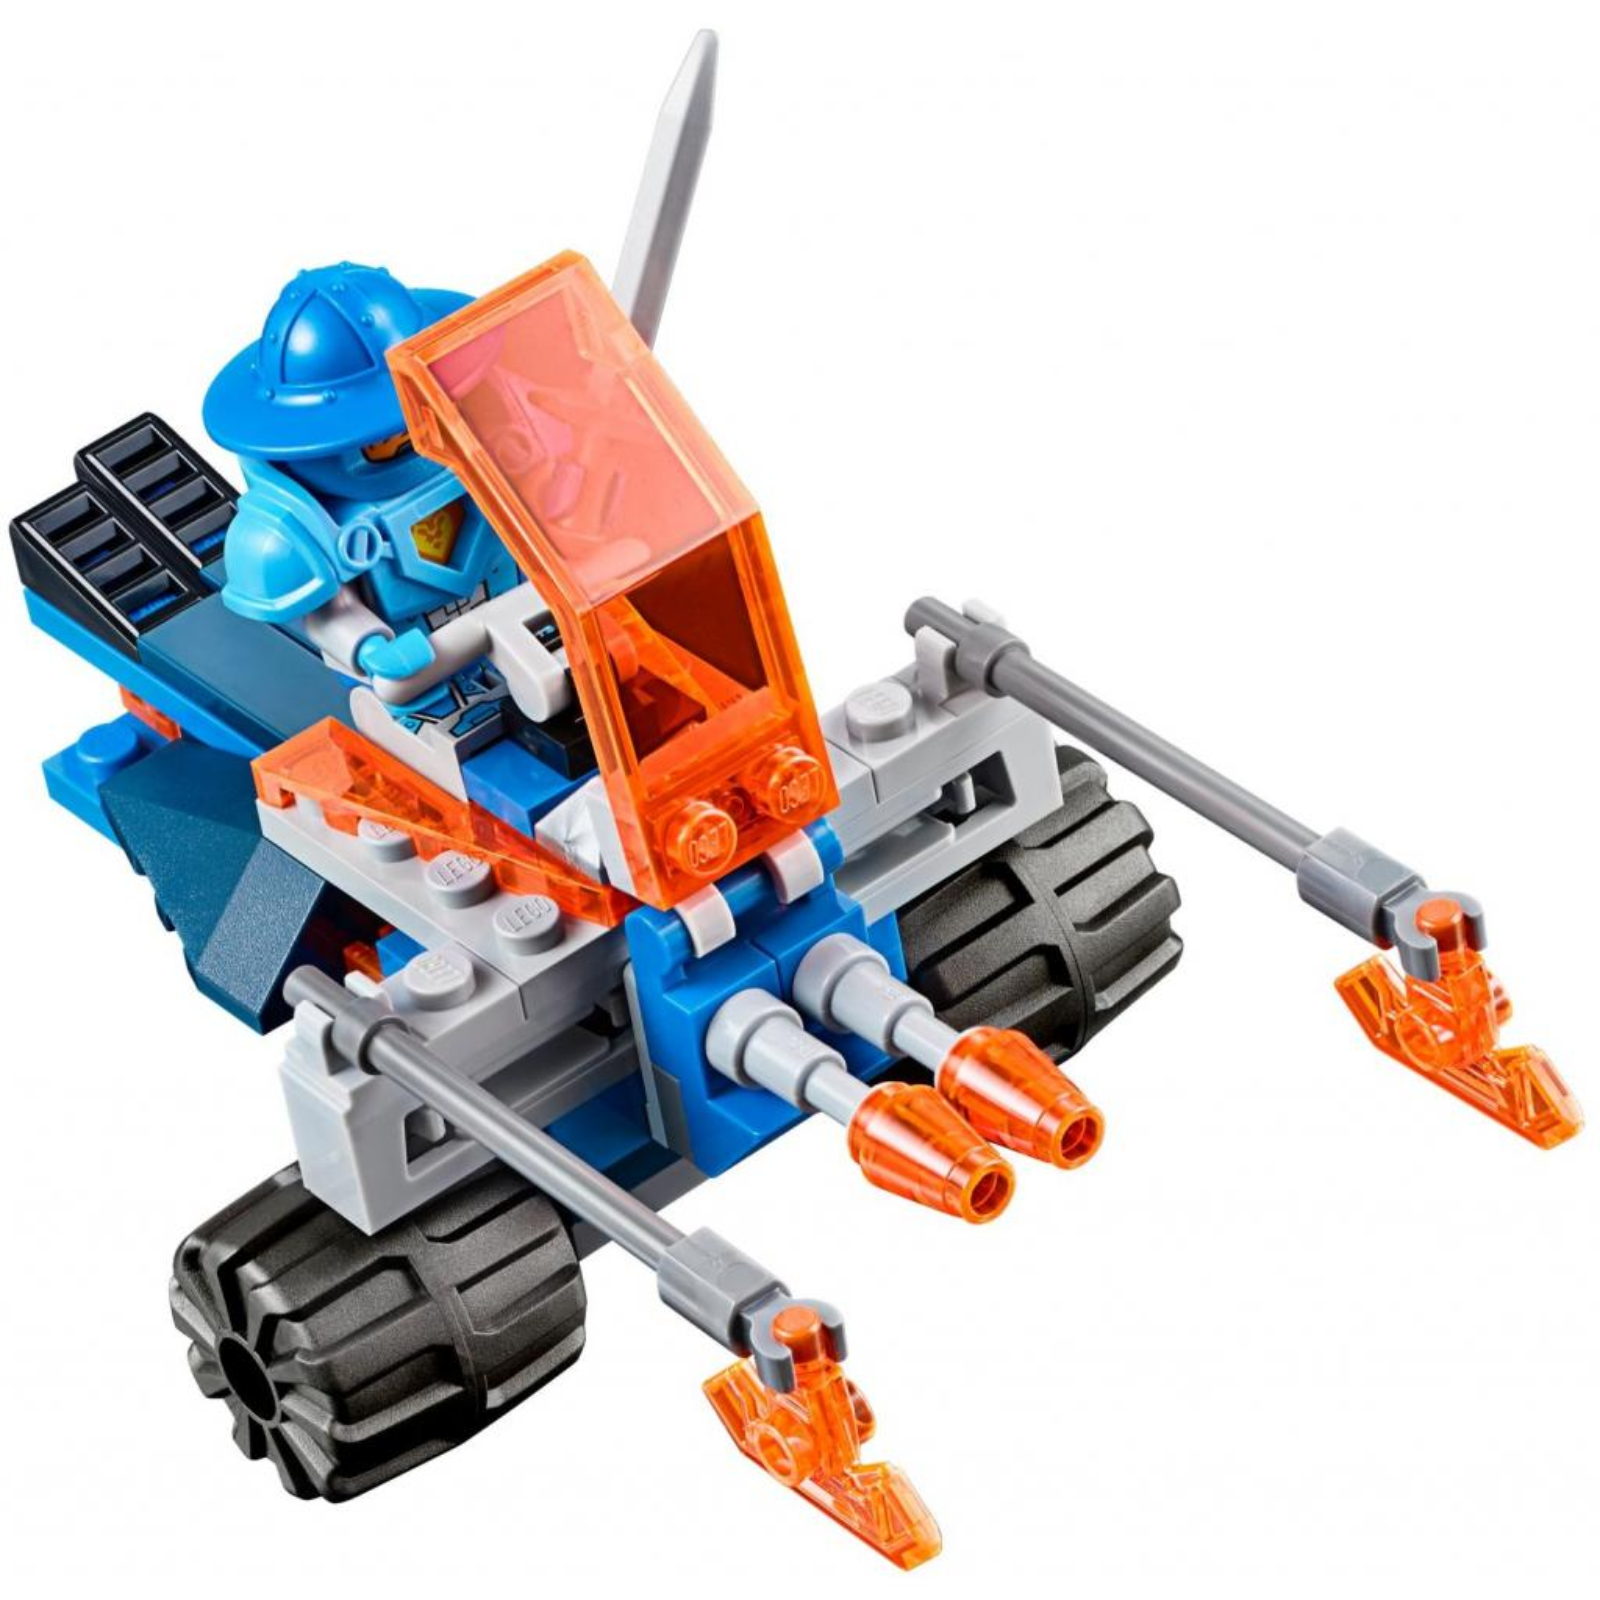 Конструктор LEGO Nexo Knights Королевский боевой бластер (70310) изображение 5